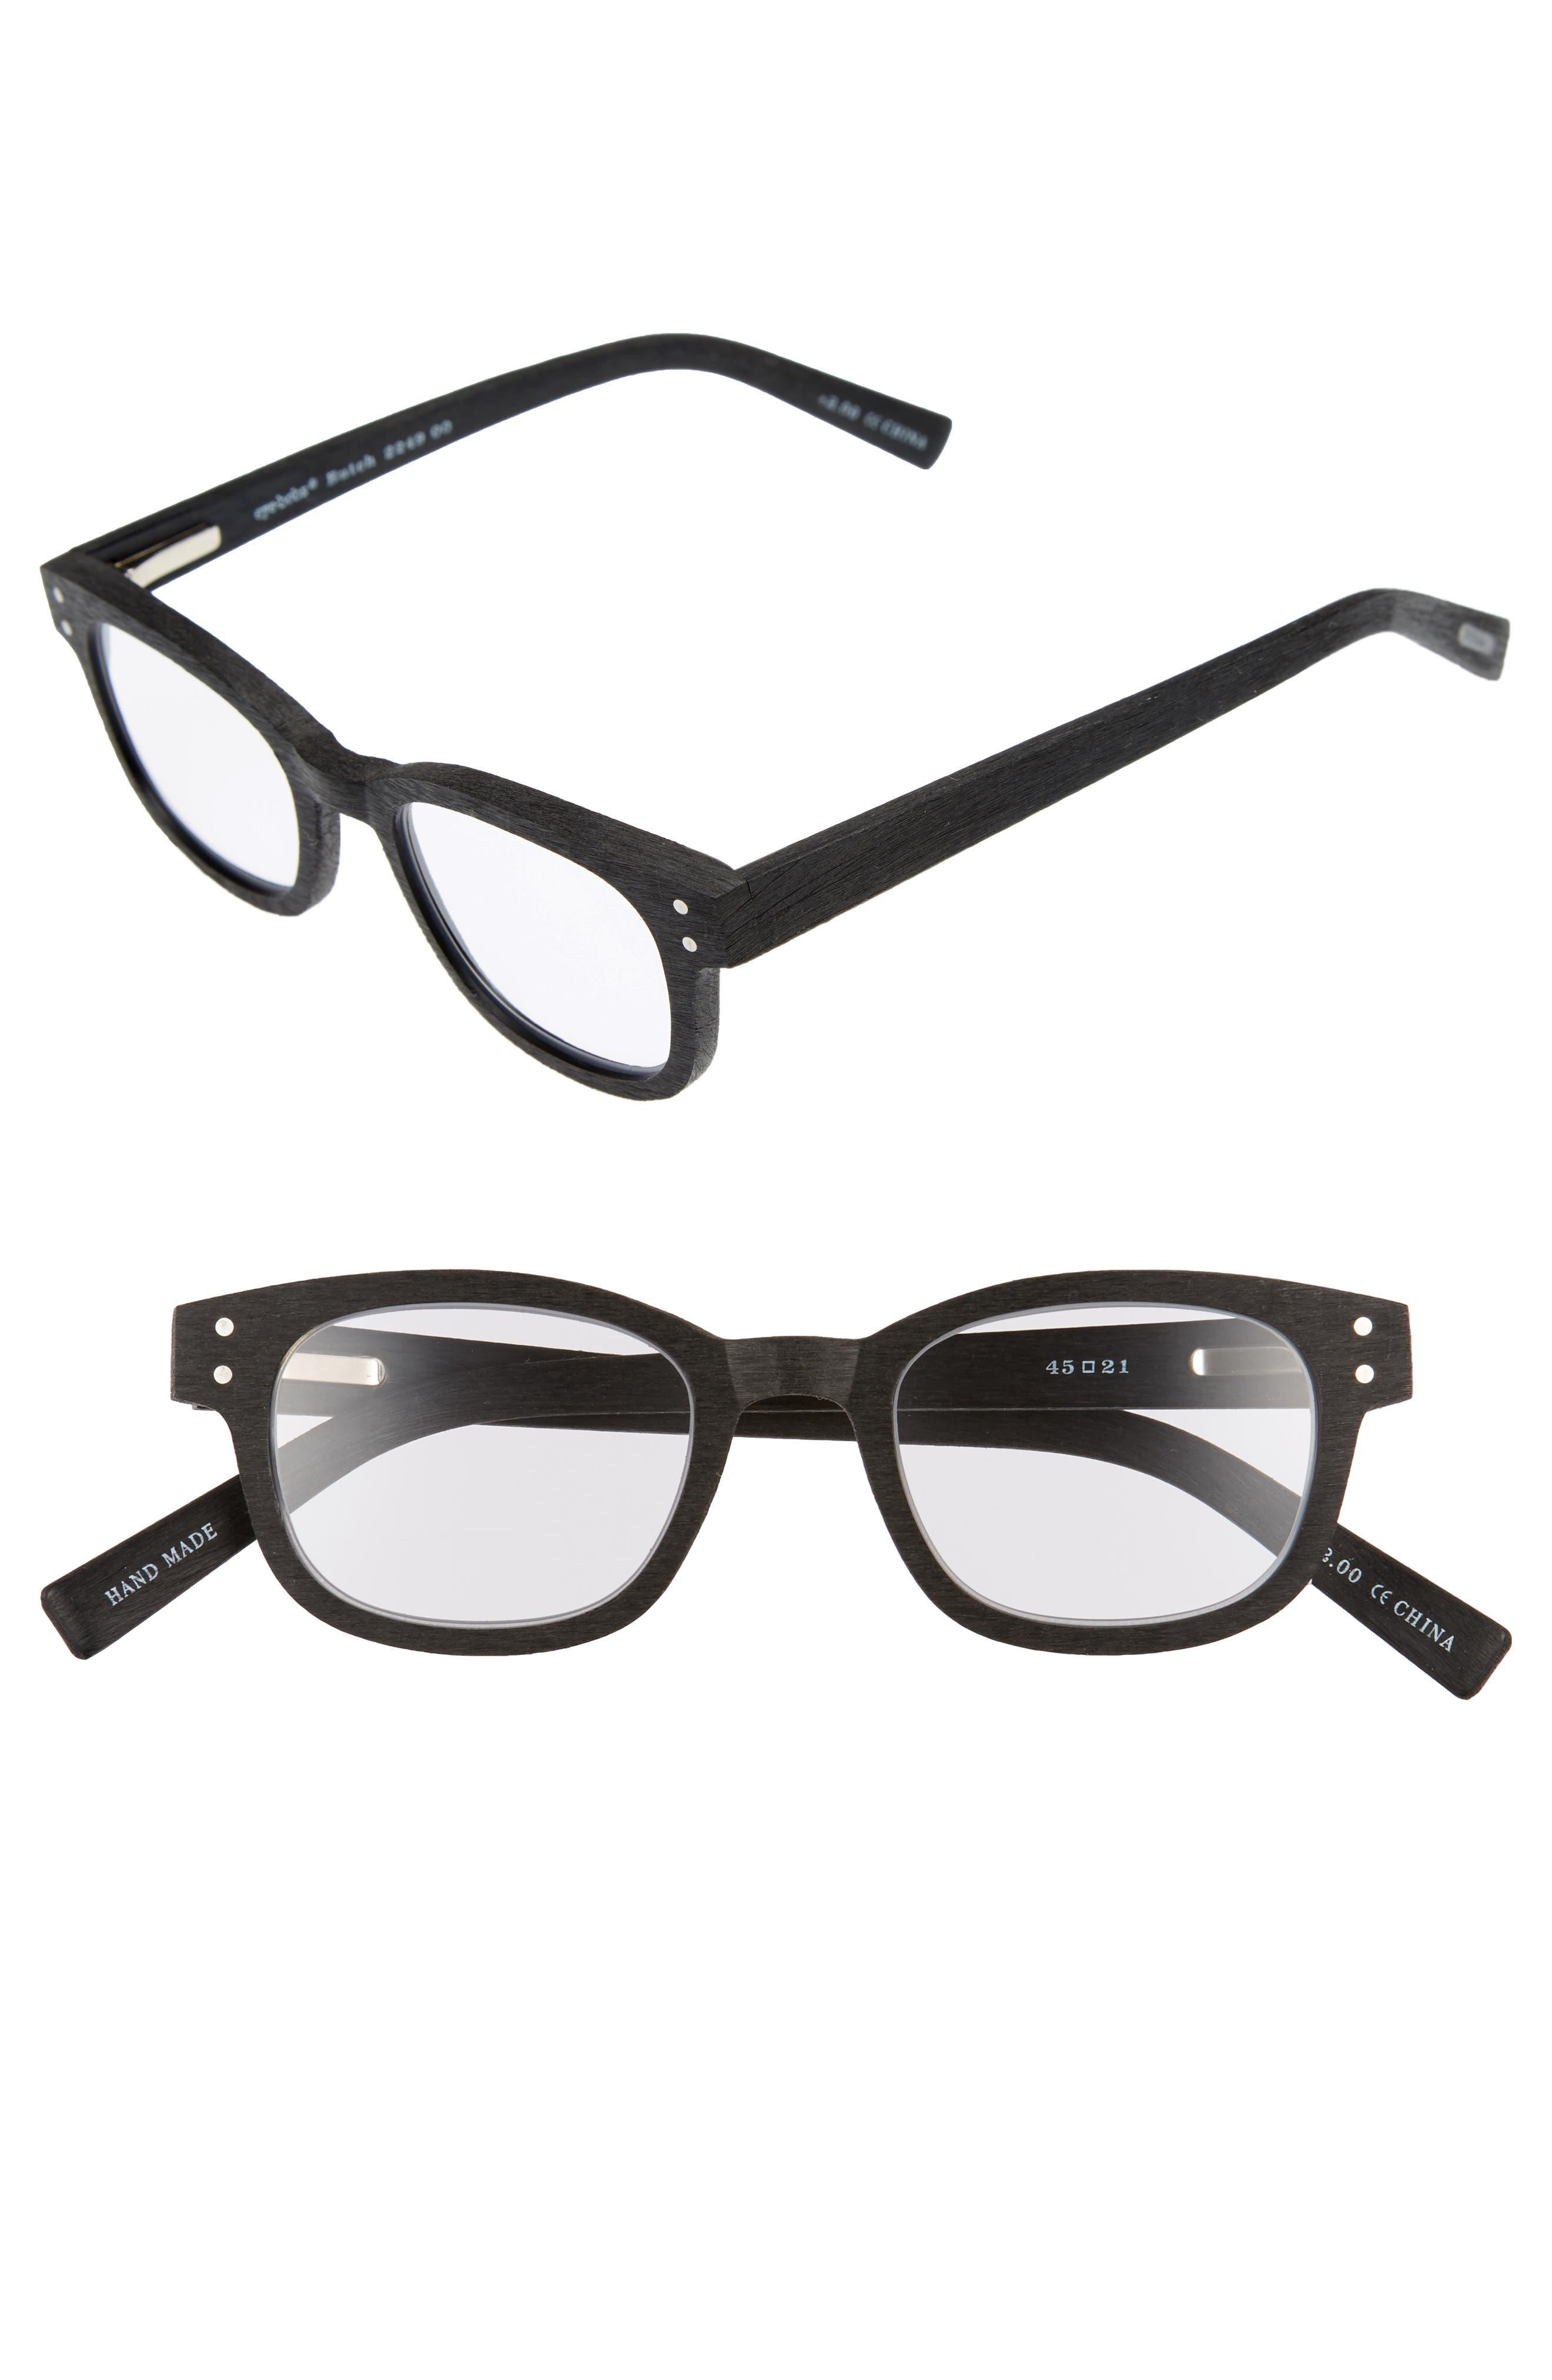 Butch 45mm Reading Glasses,                             Main thumbnail 1, color,                             MATTE BLACK WOODGRAIN